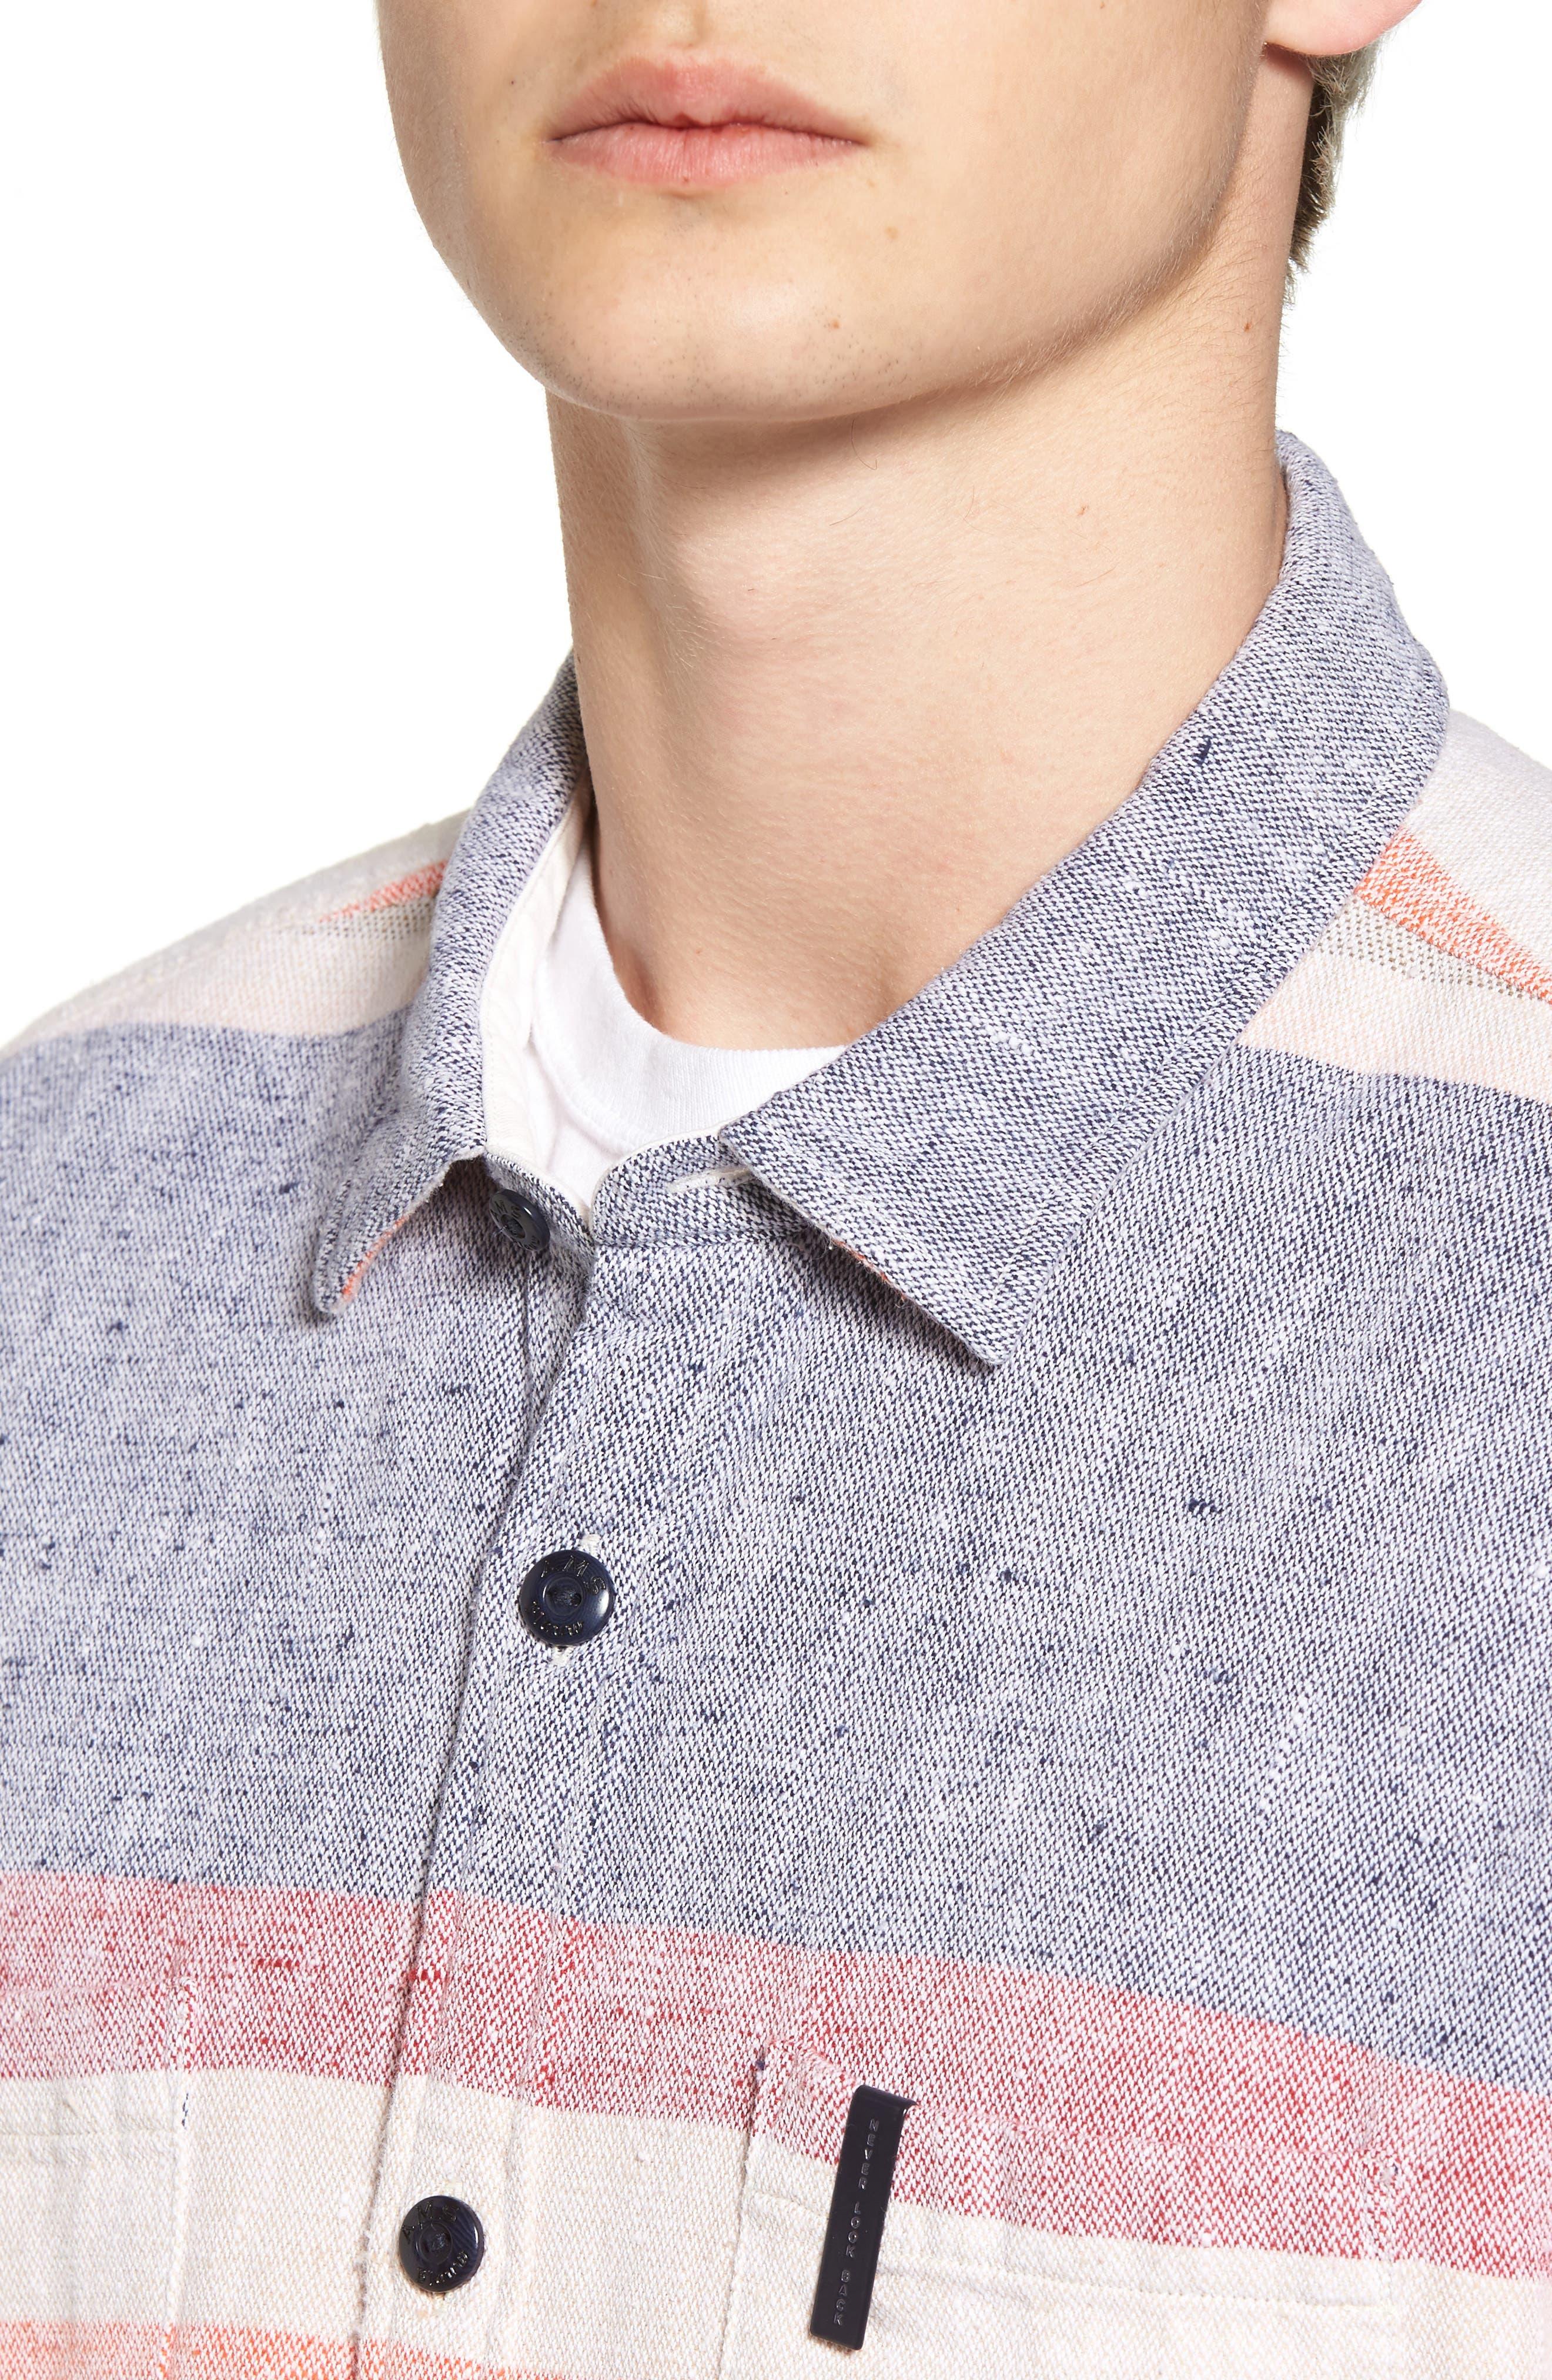 Amsterdams Summery Chunk Shirt,                             Alternate thumbnail 4, color,                             020